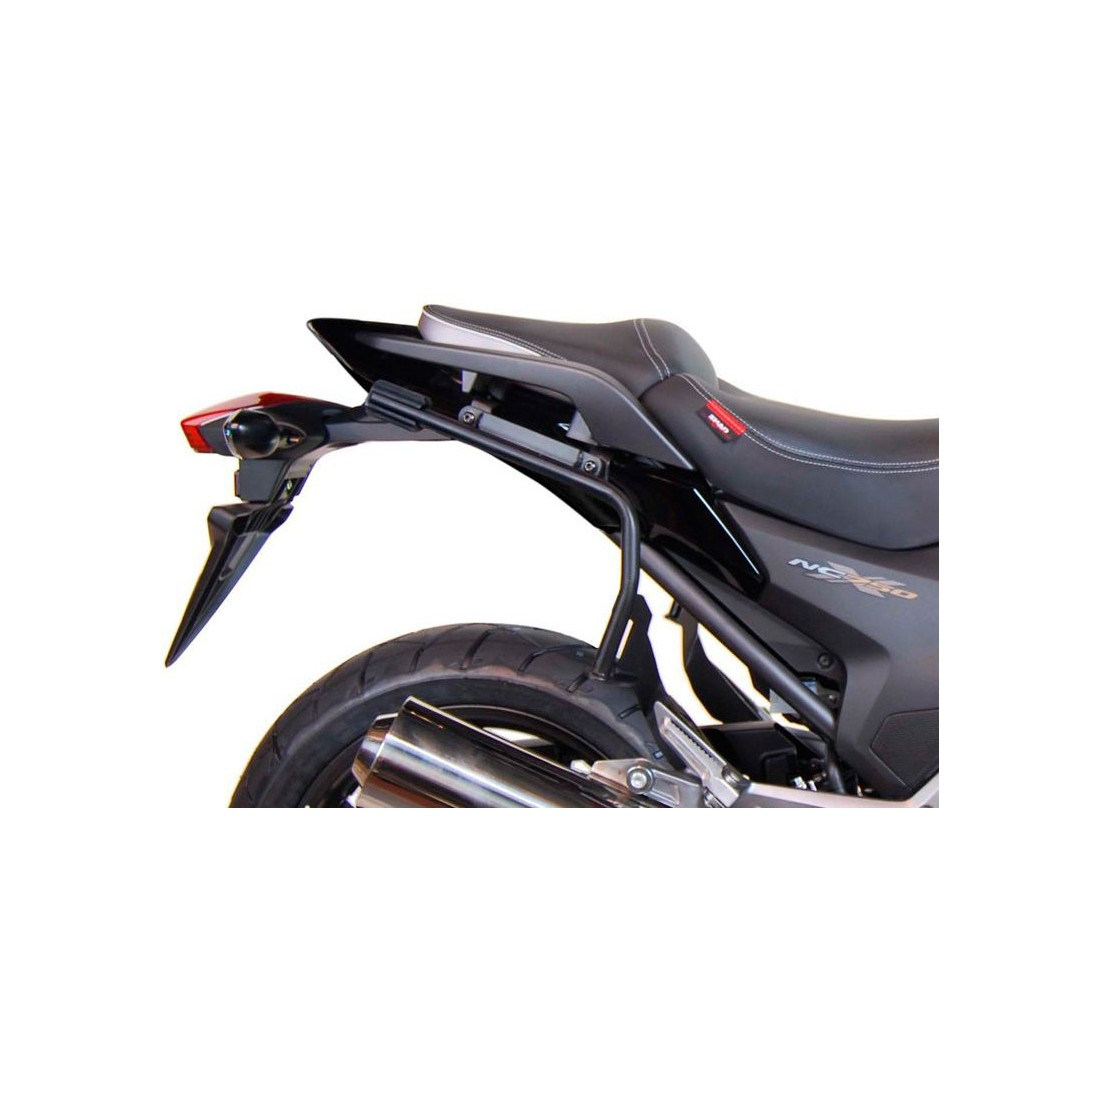 Fijación 3P System Shad Honda INTEGRA 700 12-13 INTEGRA 750 14-15 NC700 X/S 12-13 NC750 X/S 14-15